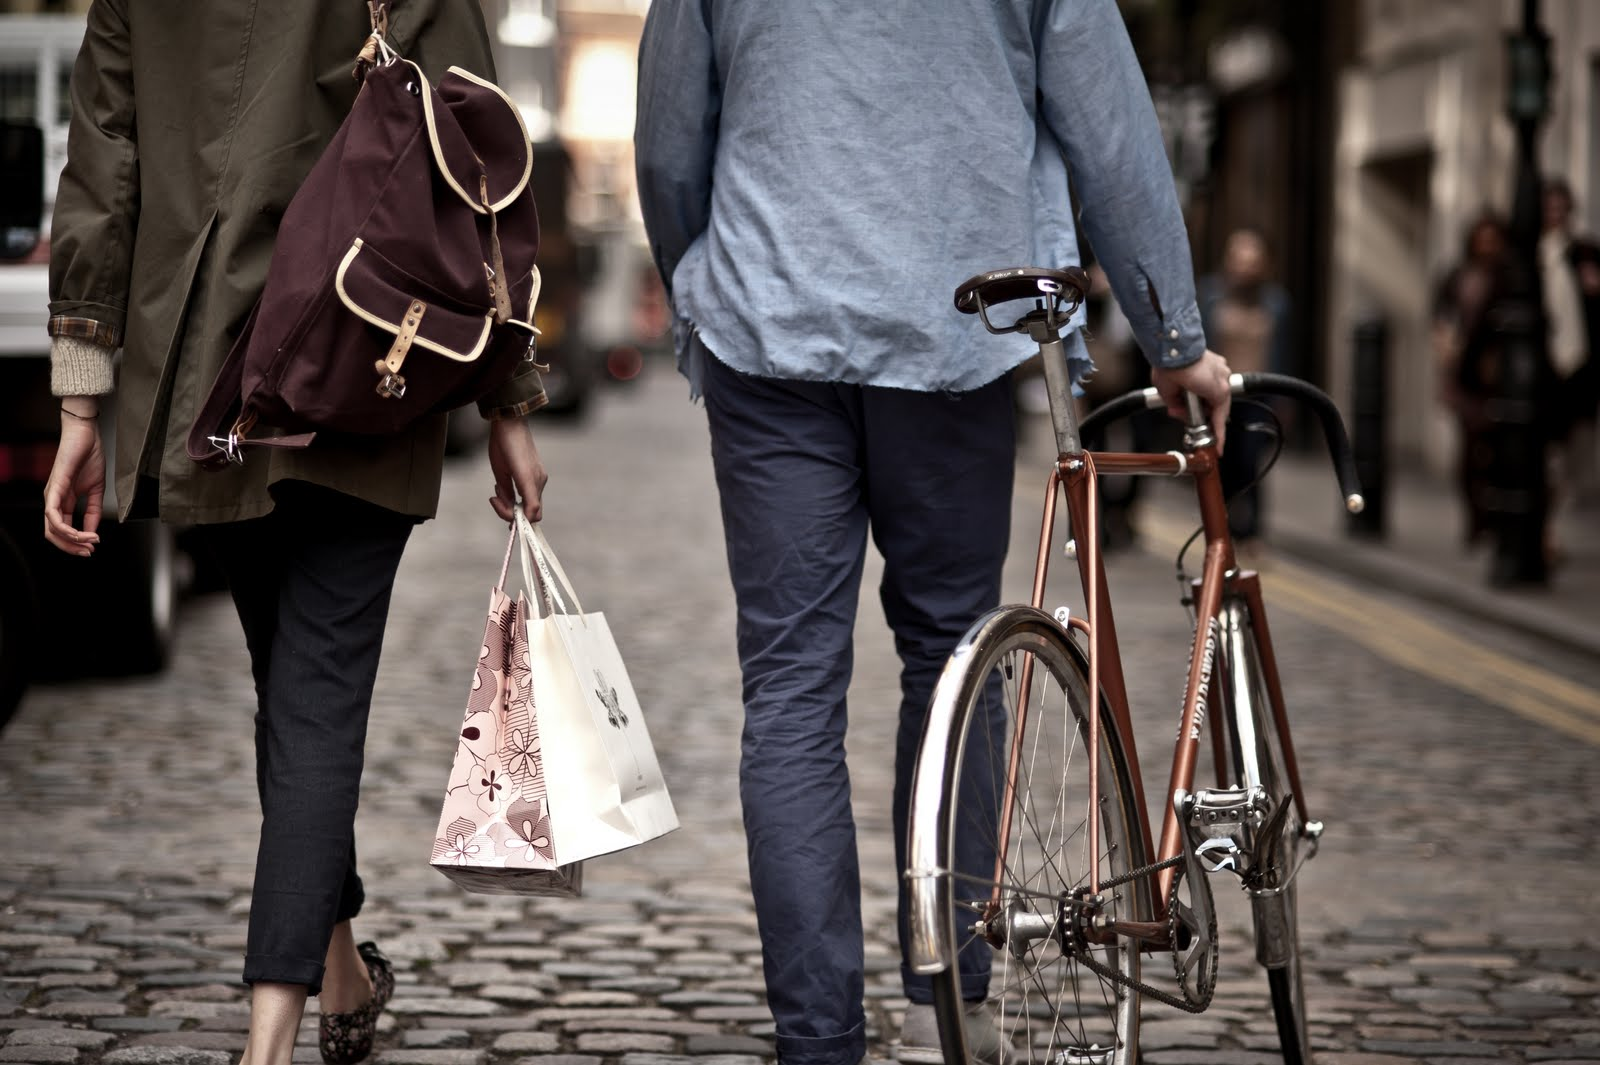 Pick The Right Gear เลือกจักรยานให้เหมาะสมกับตัวเอง 13 - Buyer Guide